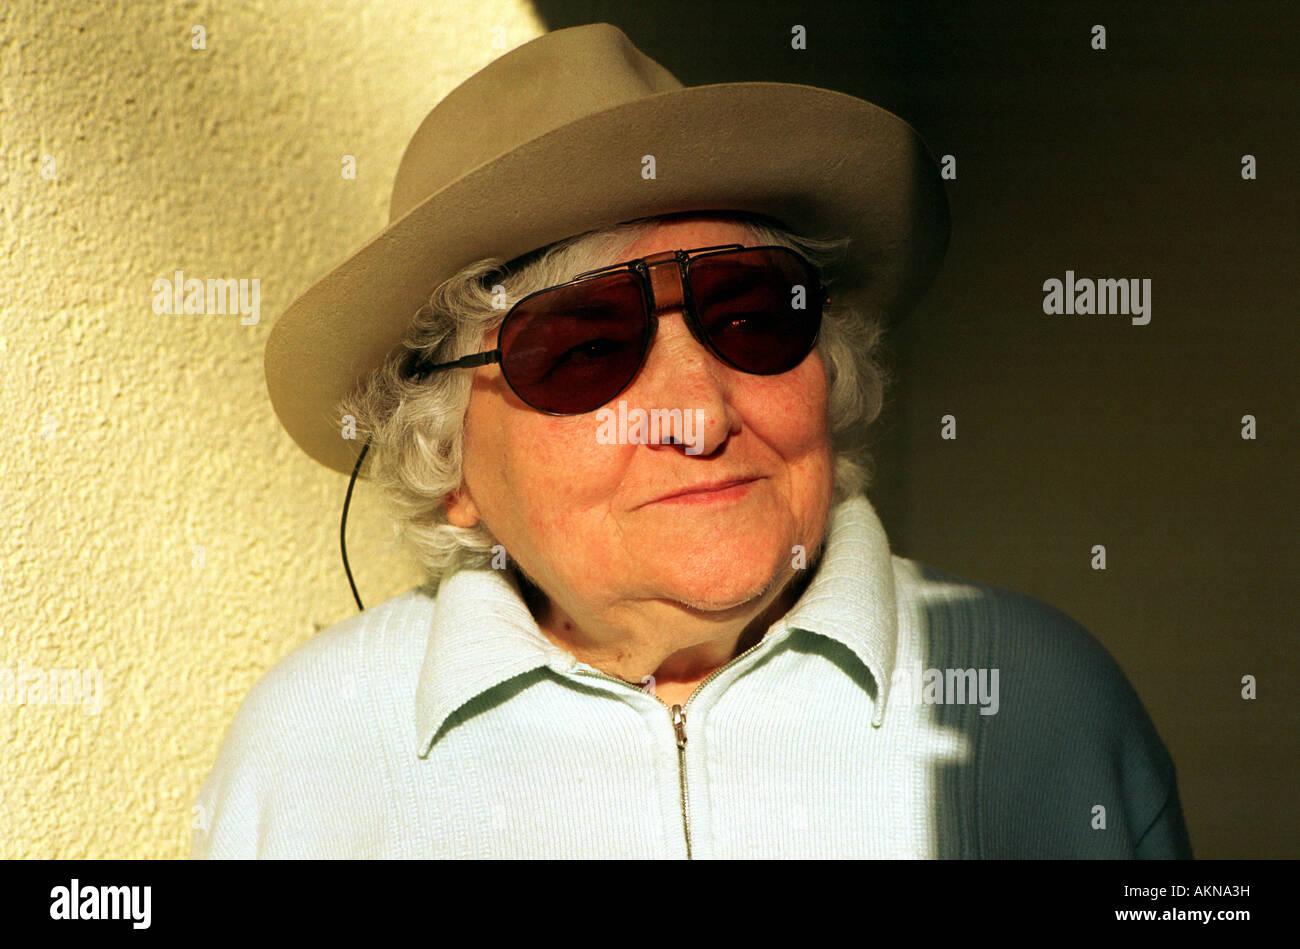 d22167f1fa41 Old Lady Sunglasses - The Best Sunglasses